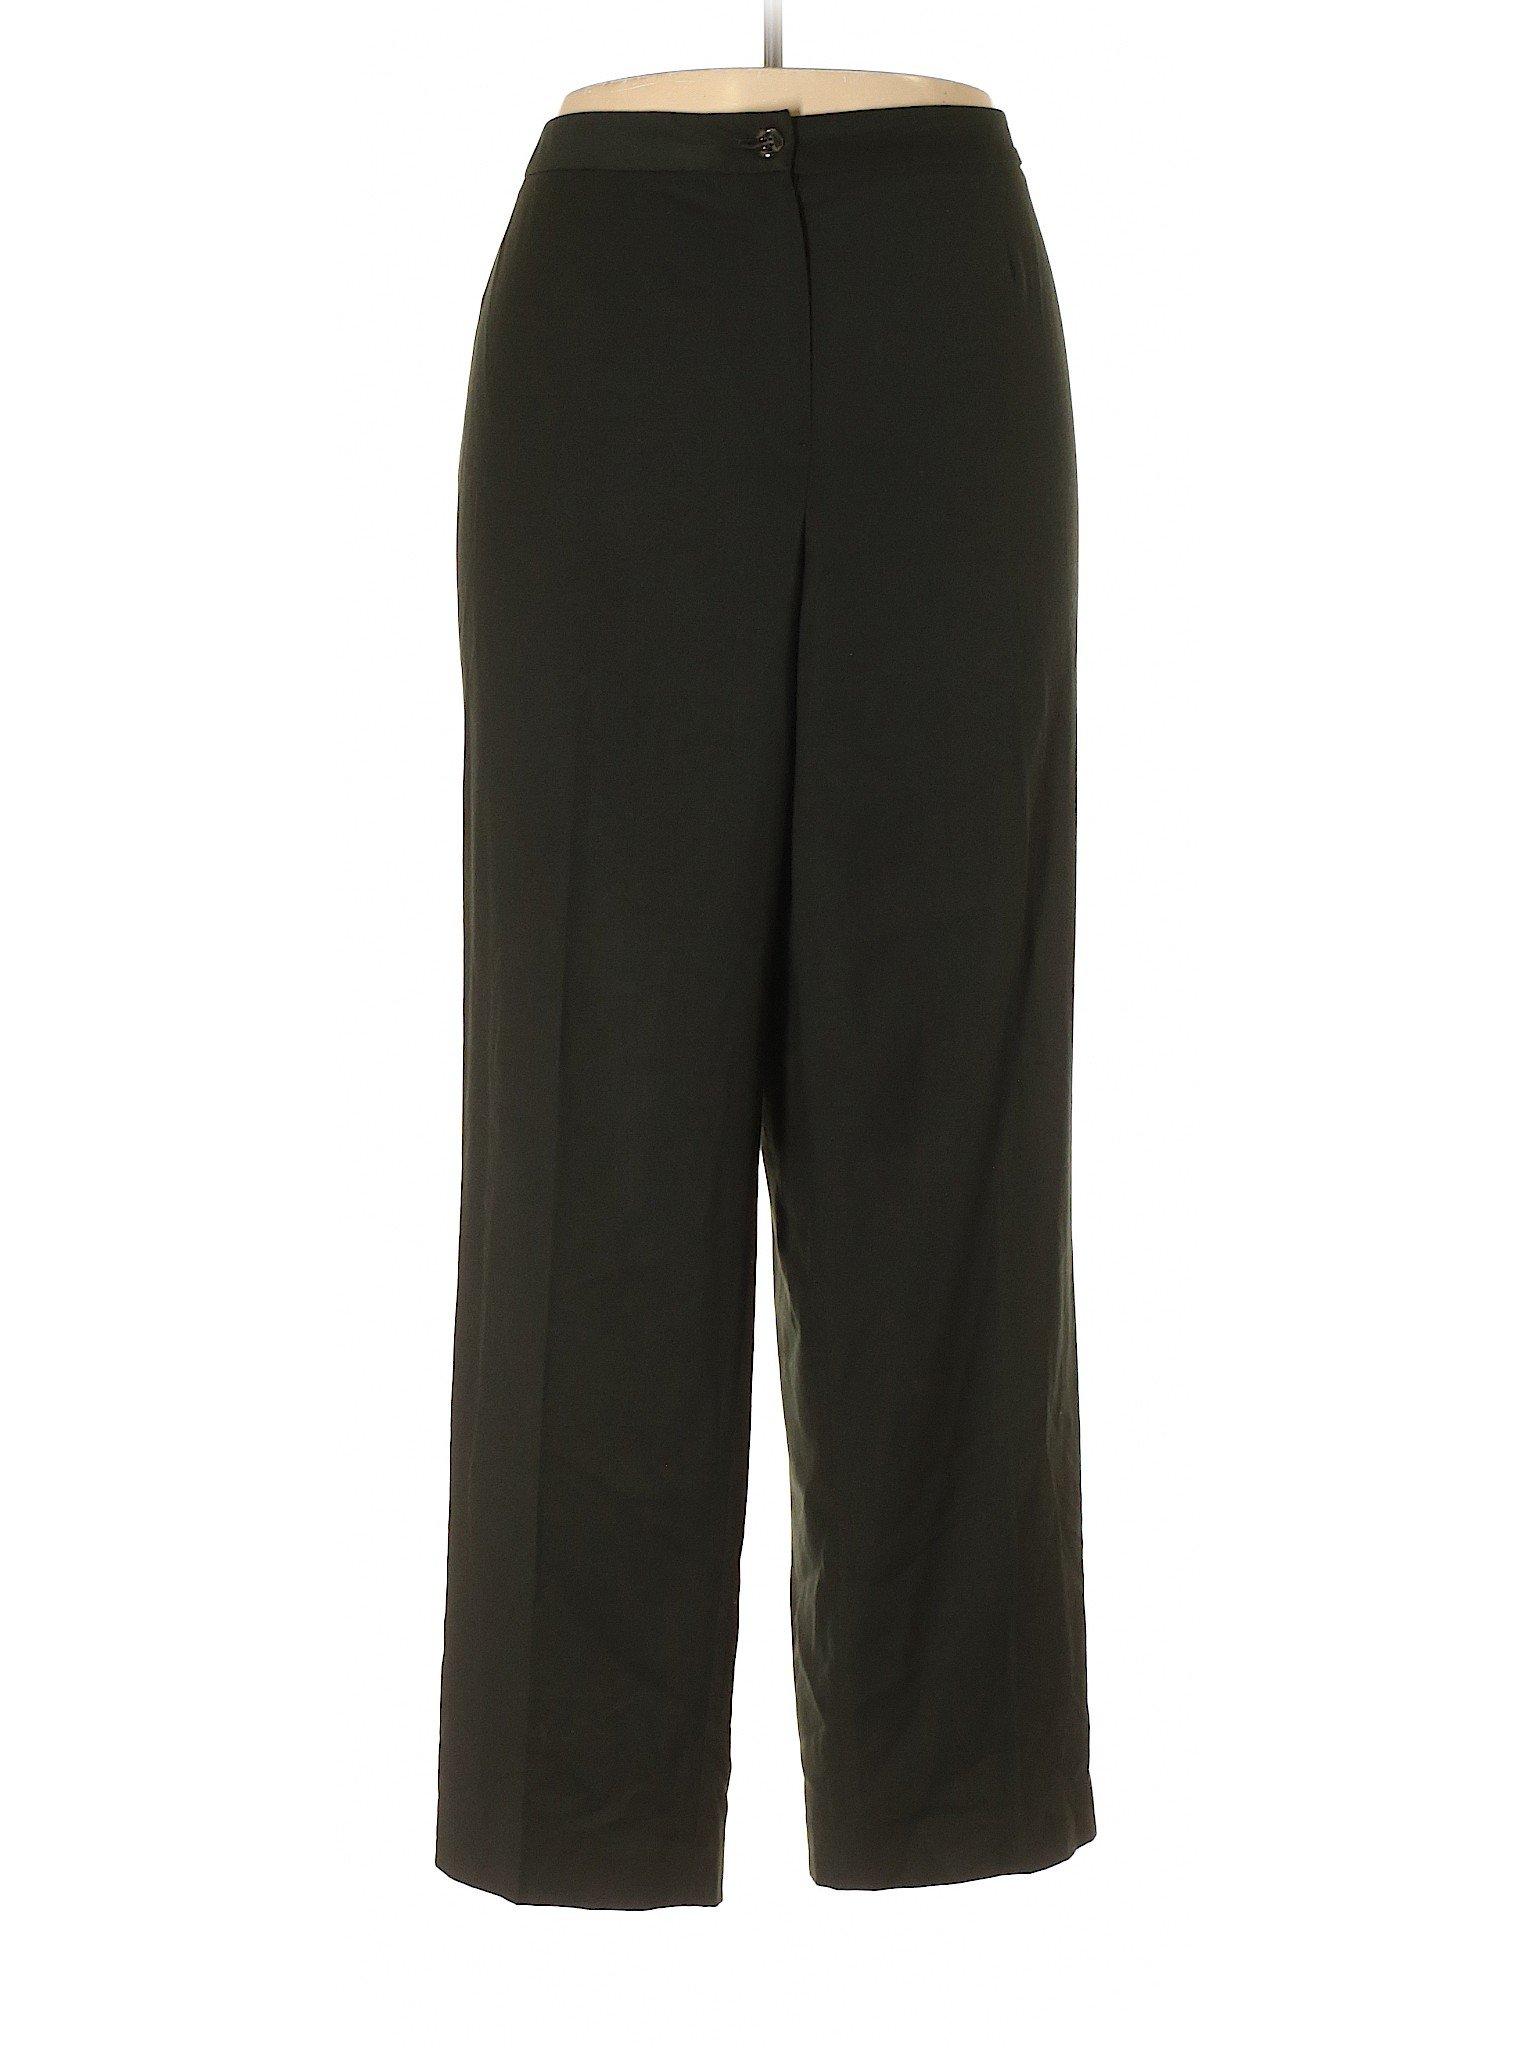 Jones York leisure Boutique Collection Pants New Dress qC54xZO7